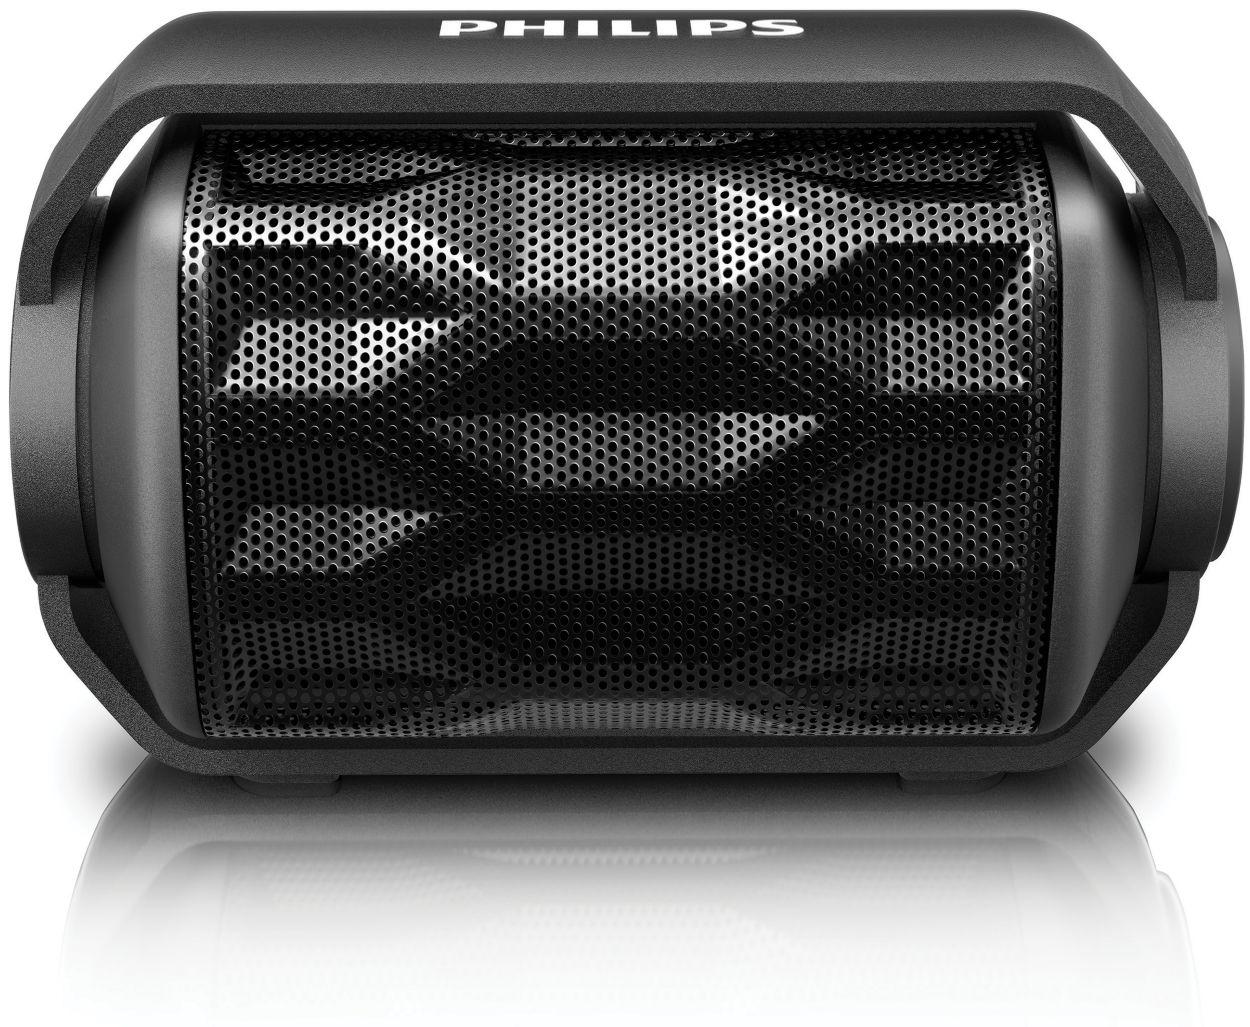 Draadloze Draagbare Luidspreker Bt2200b 00 Philips